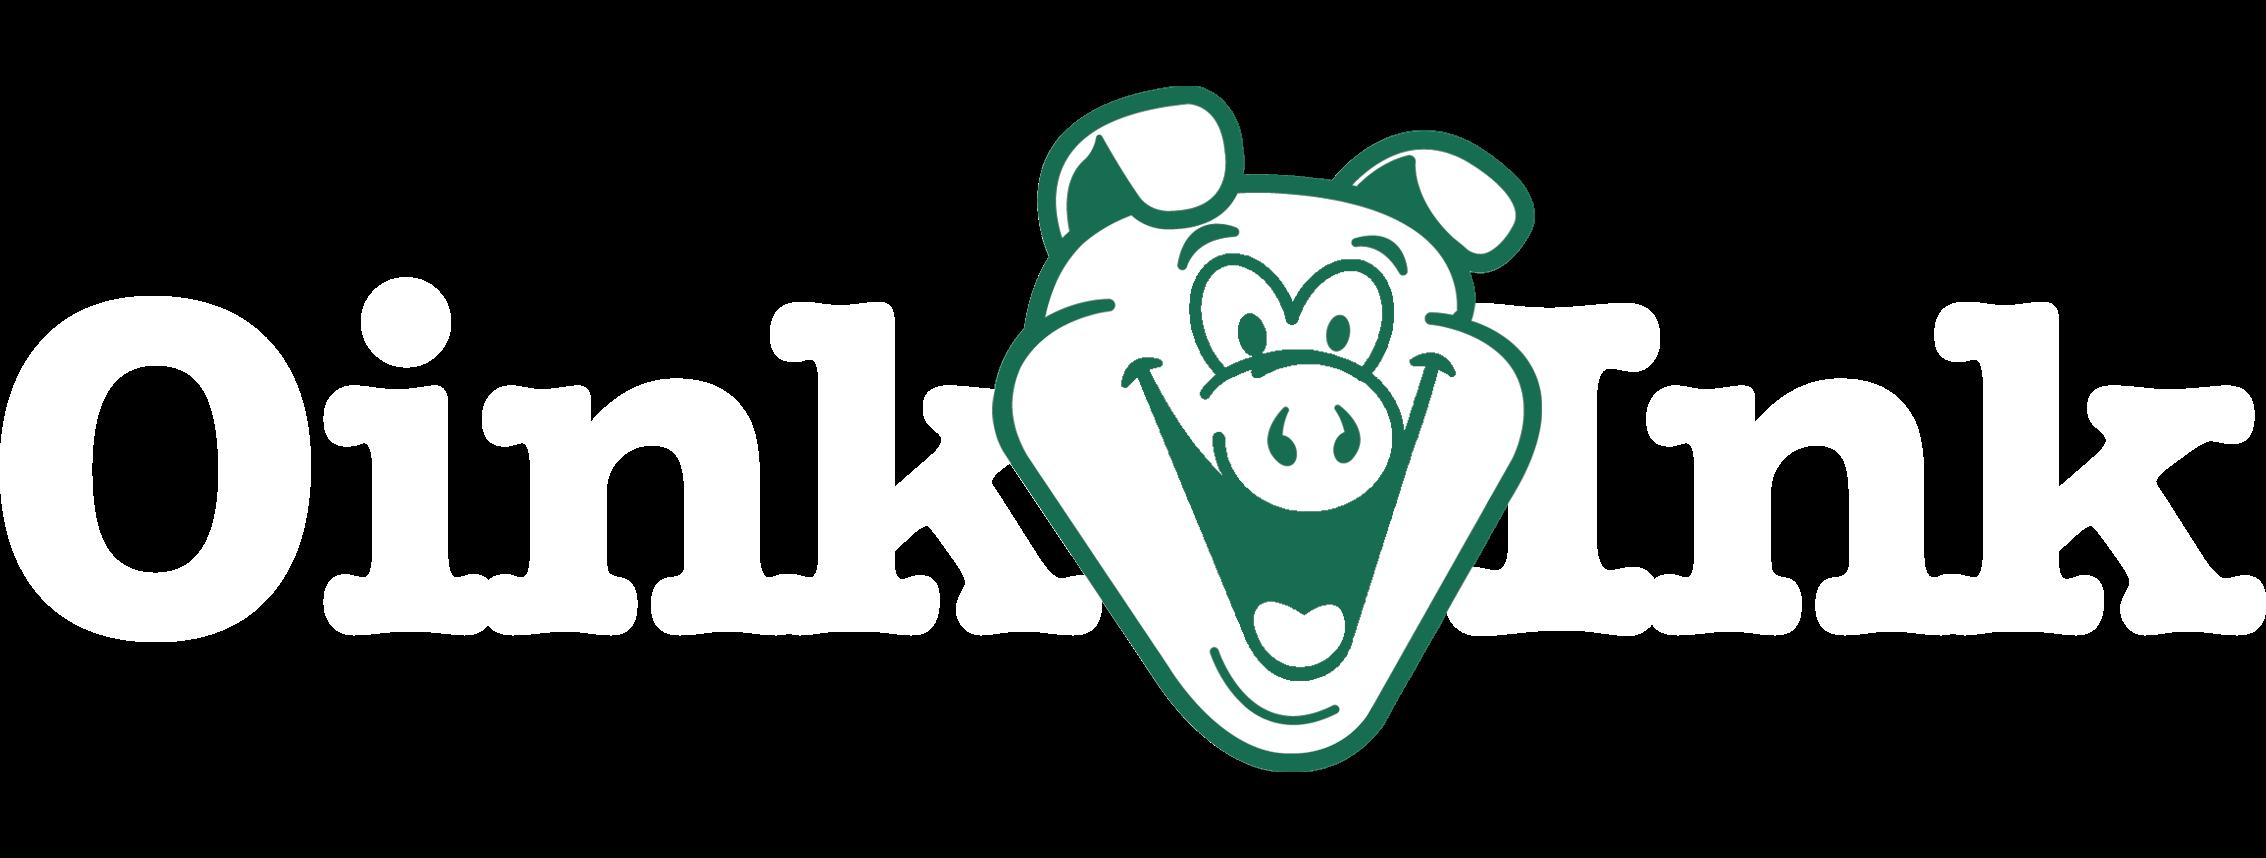 Oink Creative